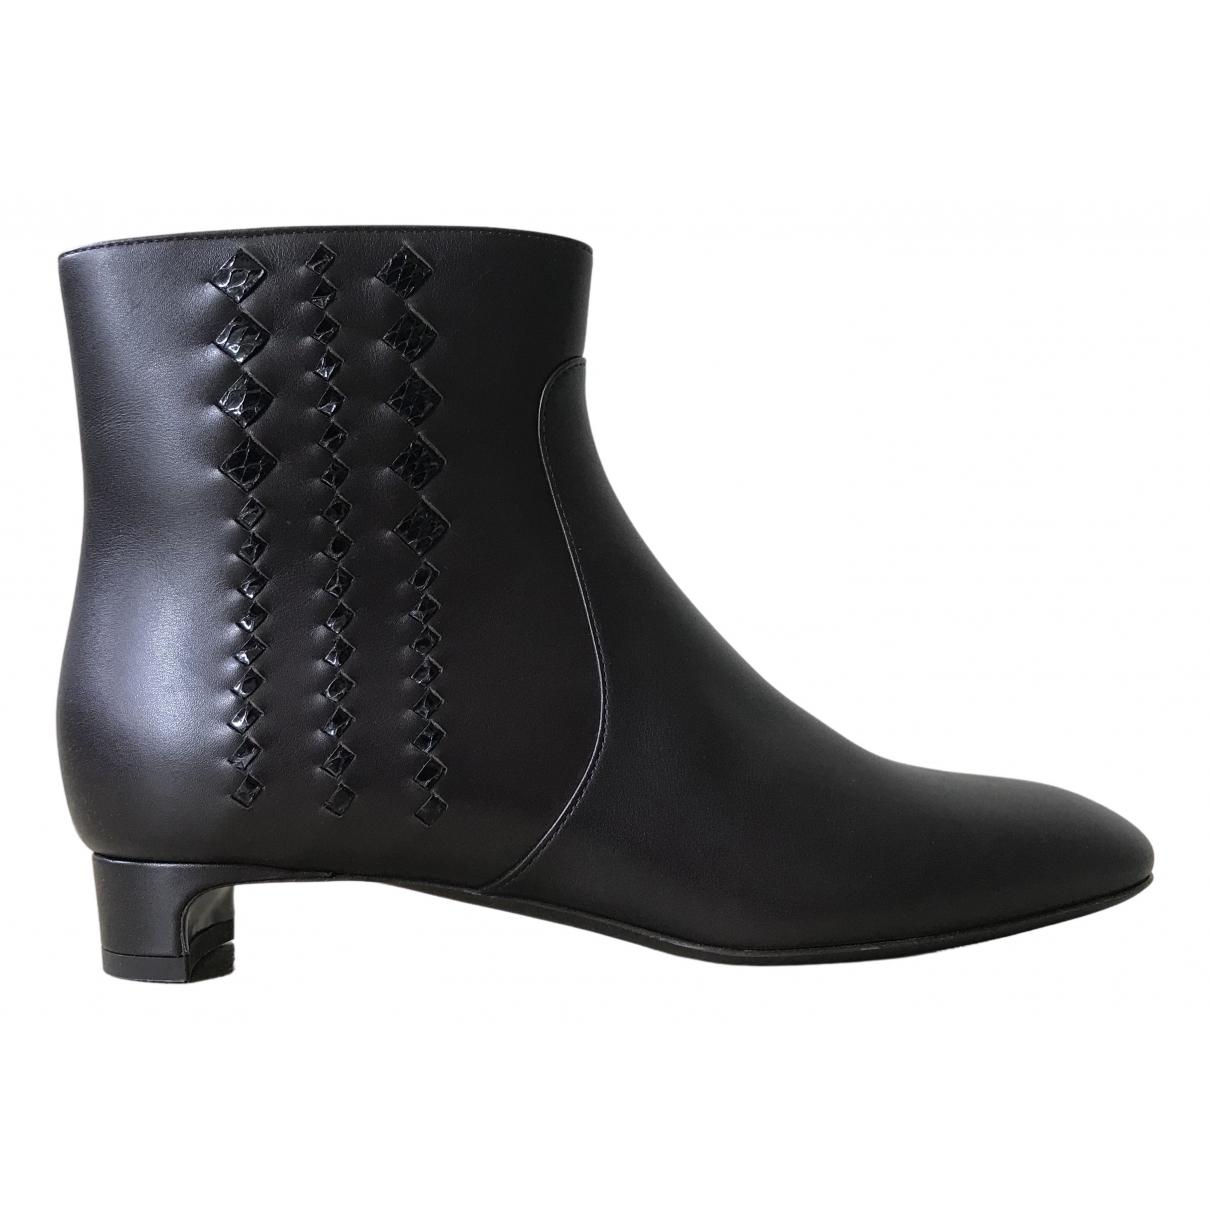 Bottega Veneta \N Brown Leather Ankle boots for Women 37 EU